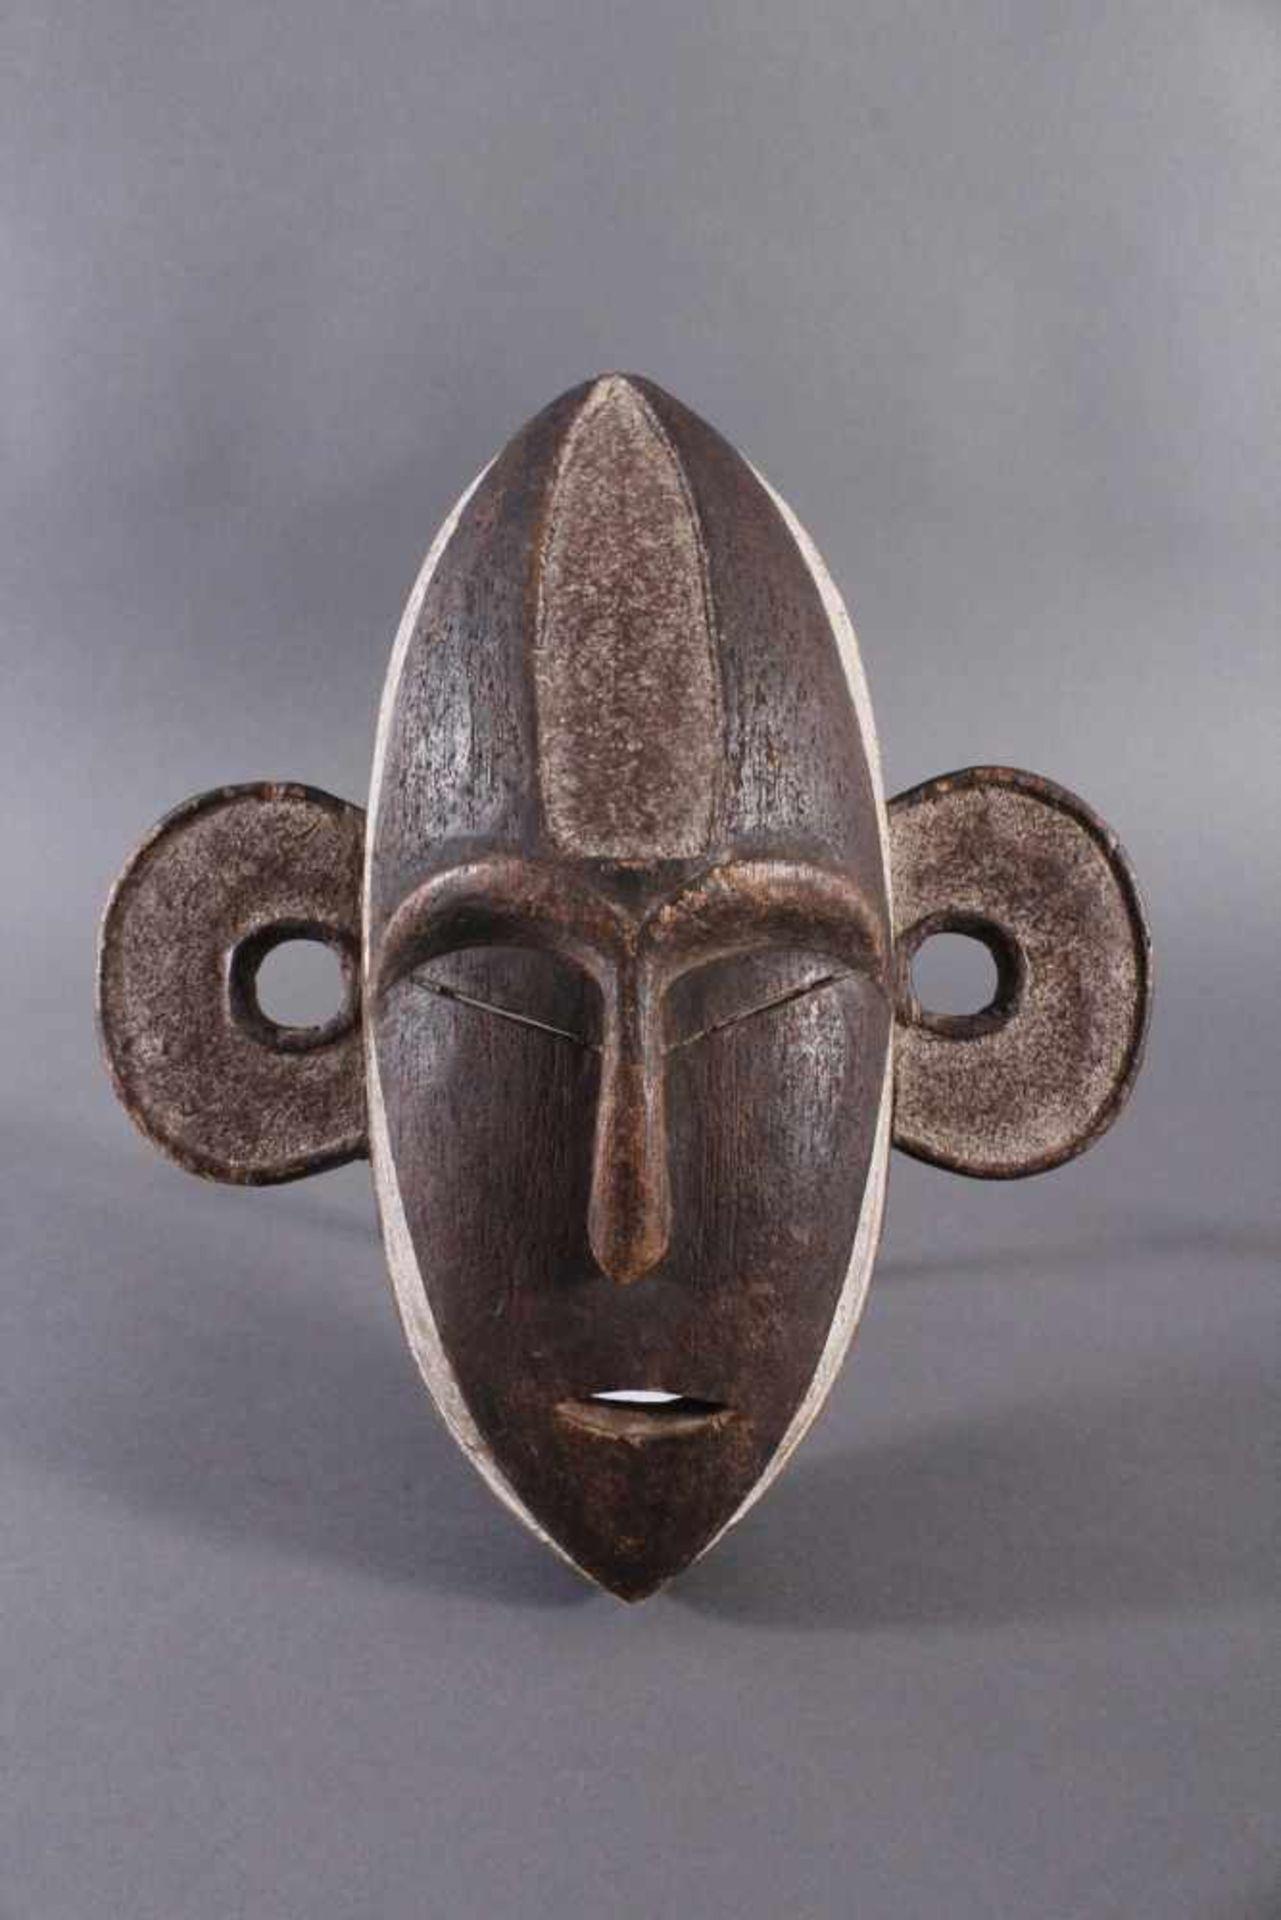 Antike Maske, Boa, Kongo 1. Hälfte 20. Jh.Holz geschnitzt, dunkle Patina, Reste weißer Bemalung,